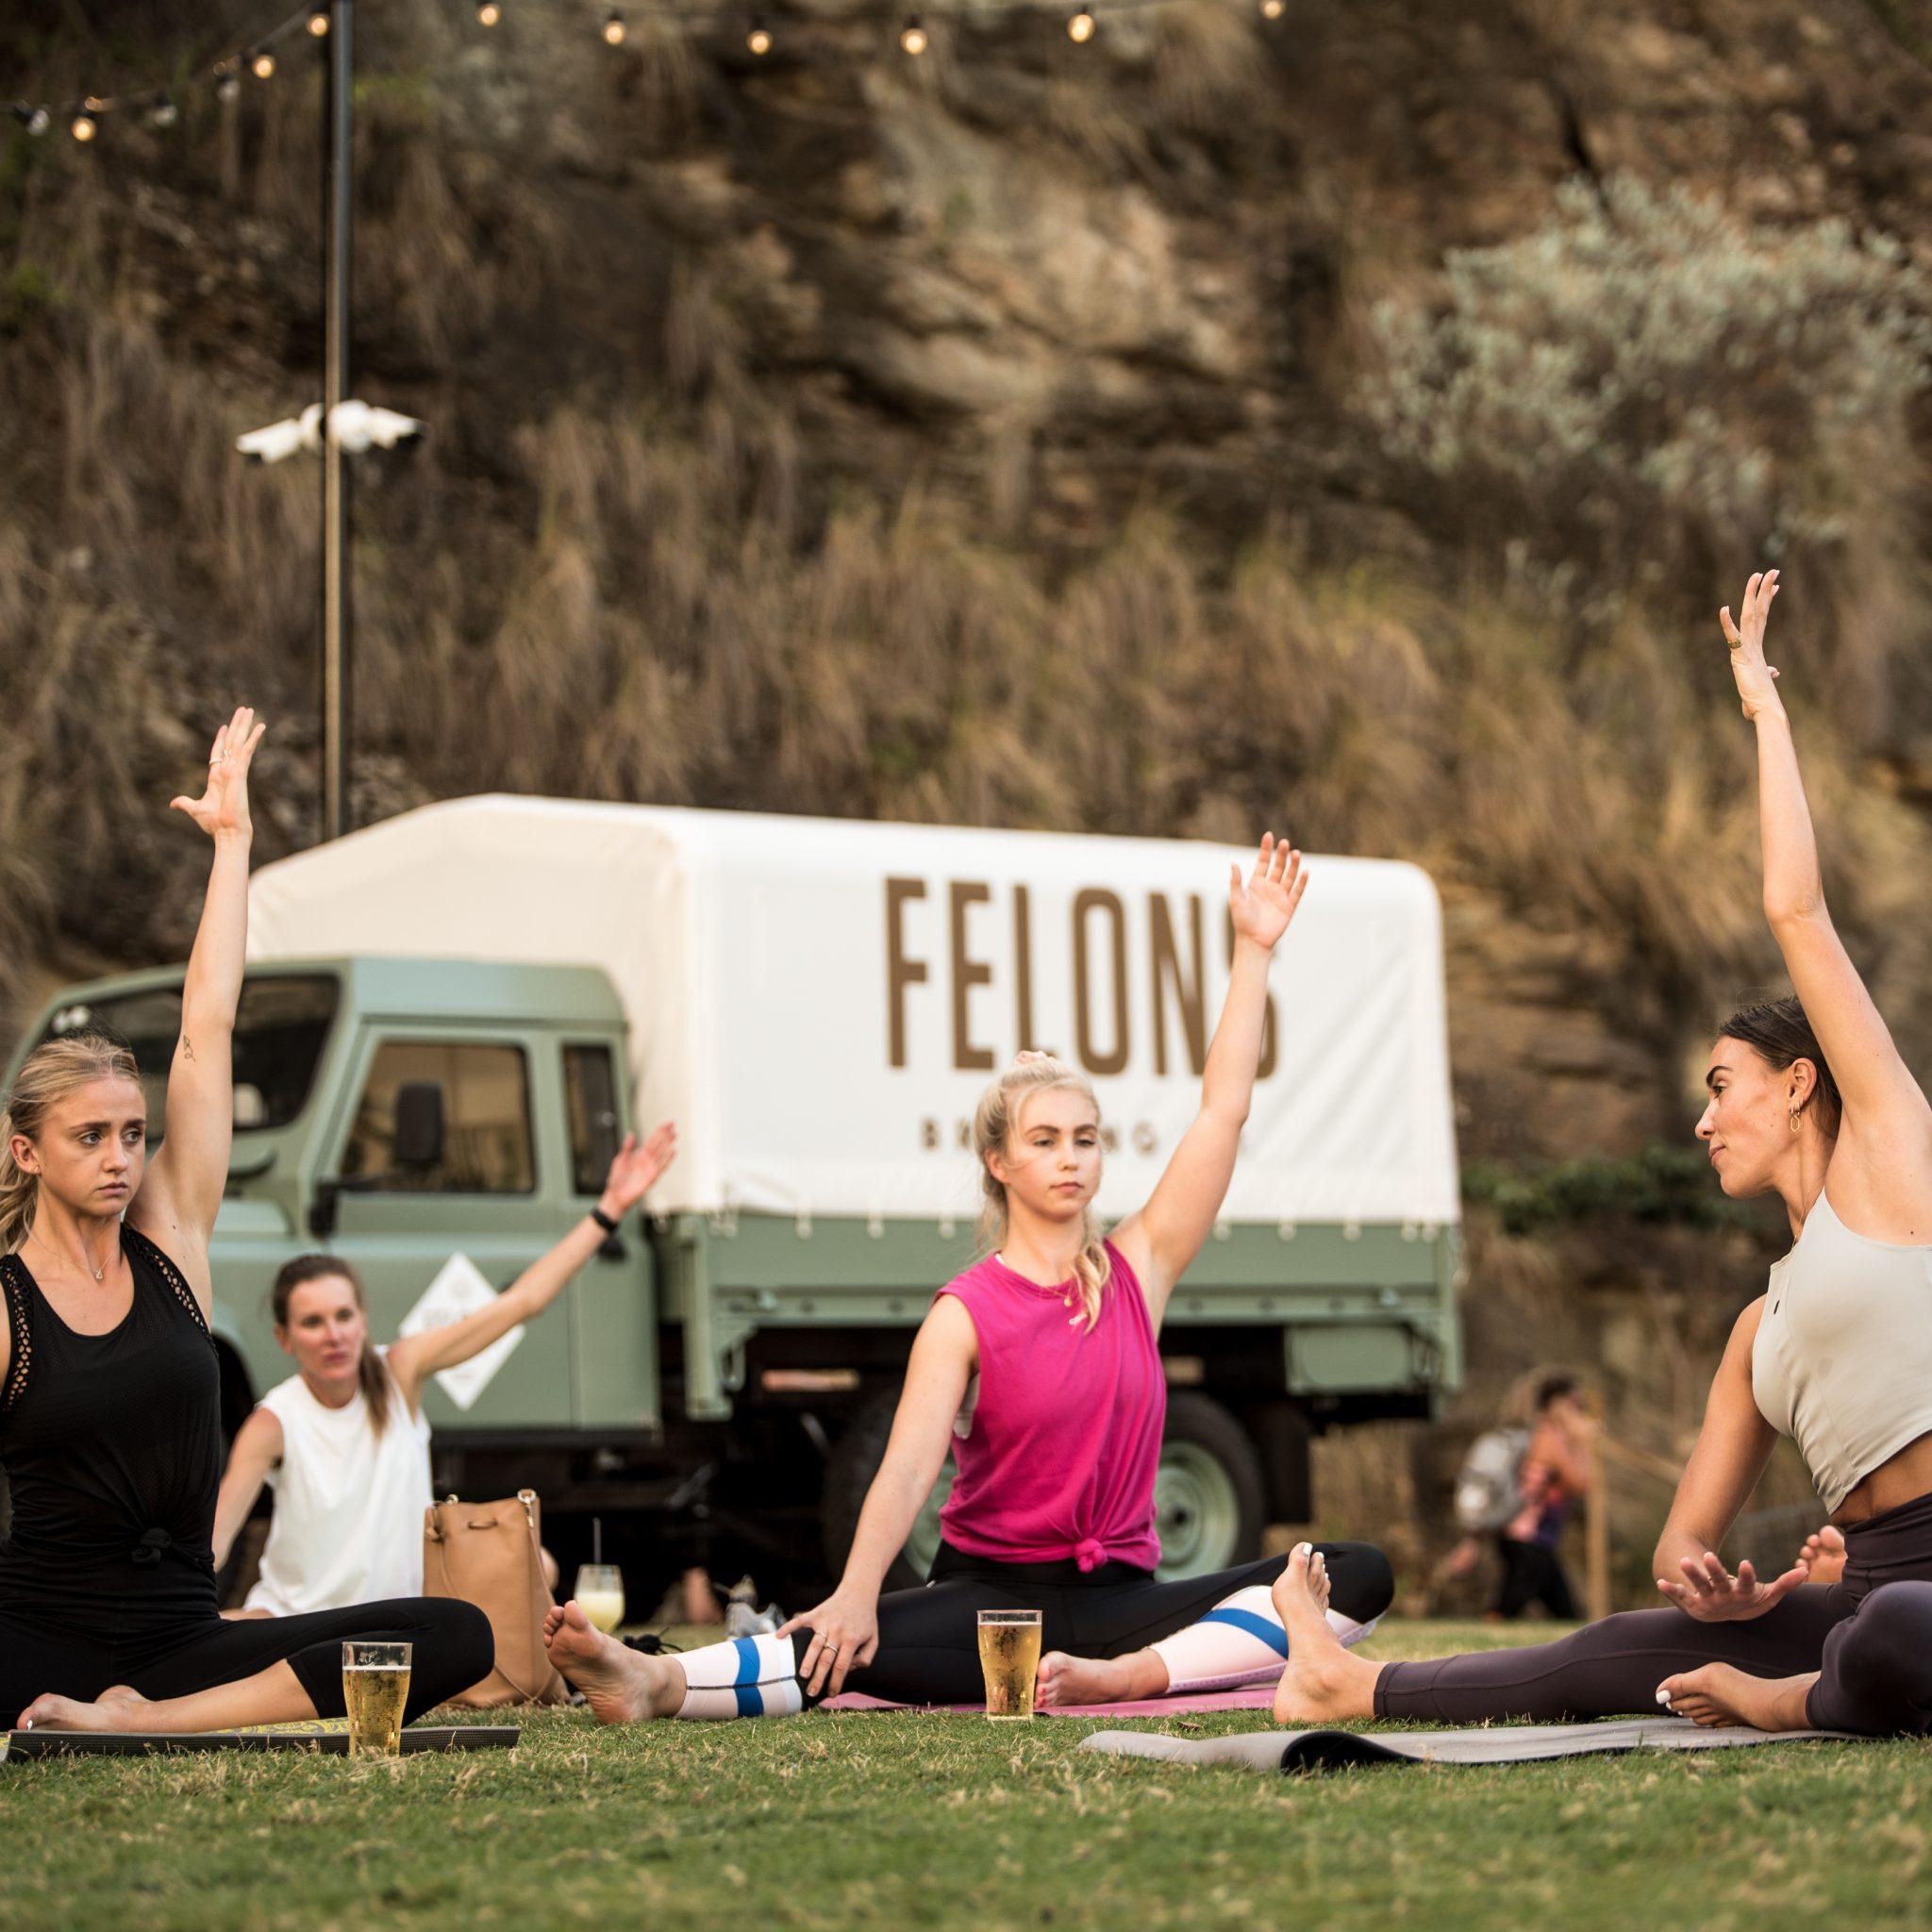 Felons_Beer-Yoga_A-Frames_blog-post2-1.jpg